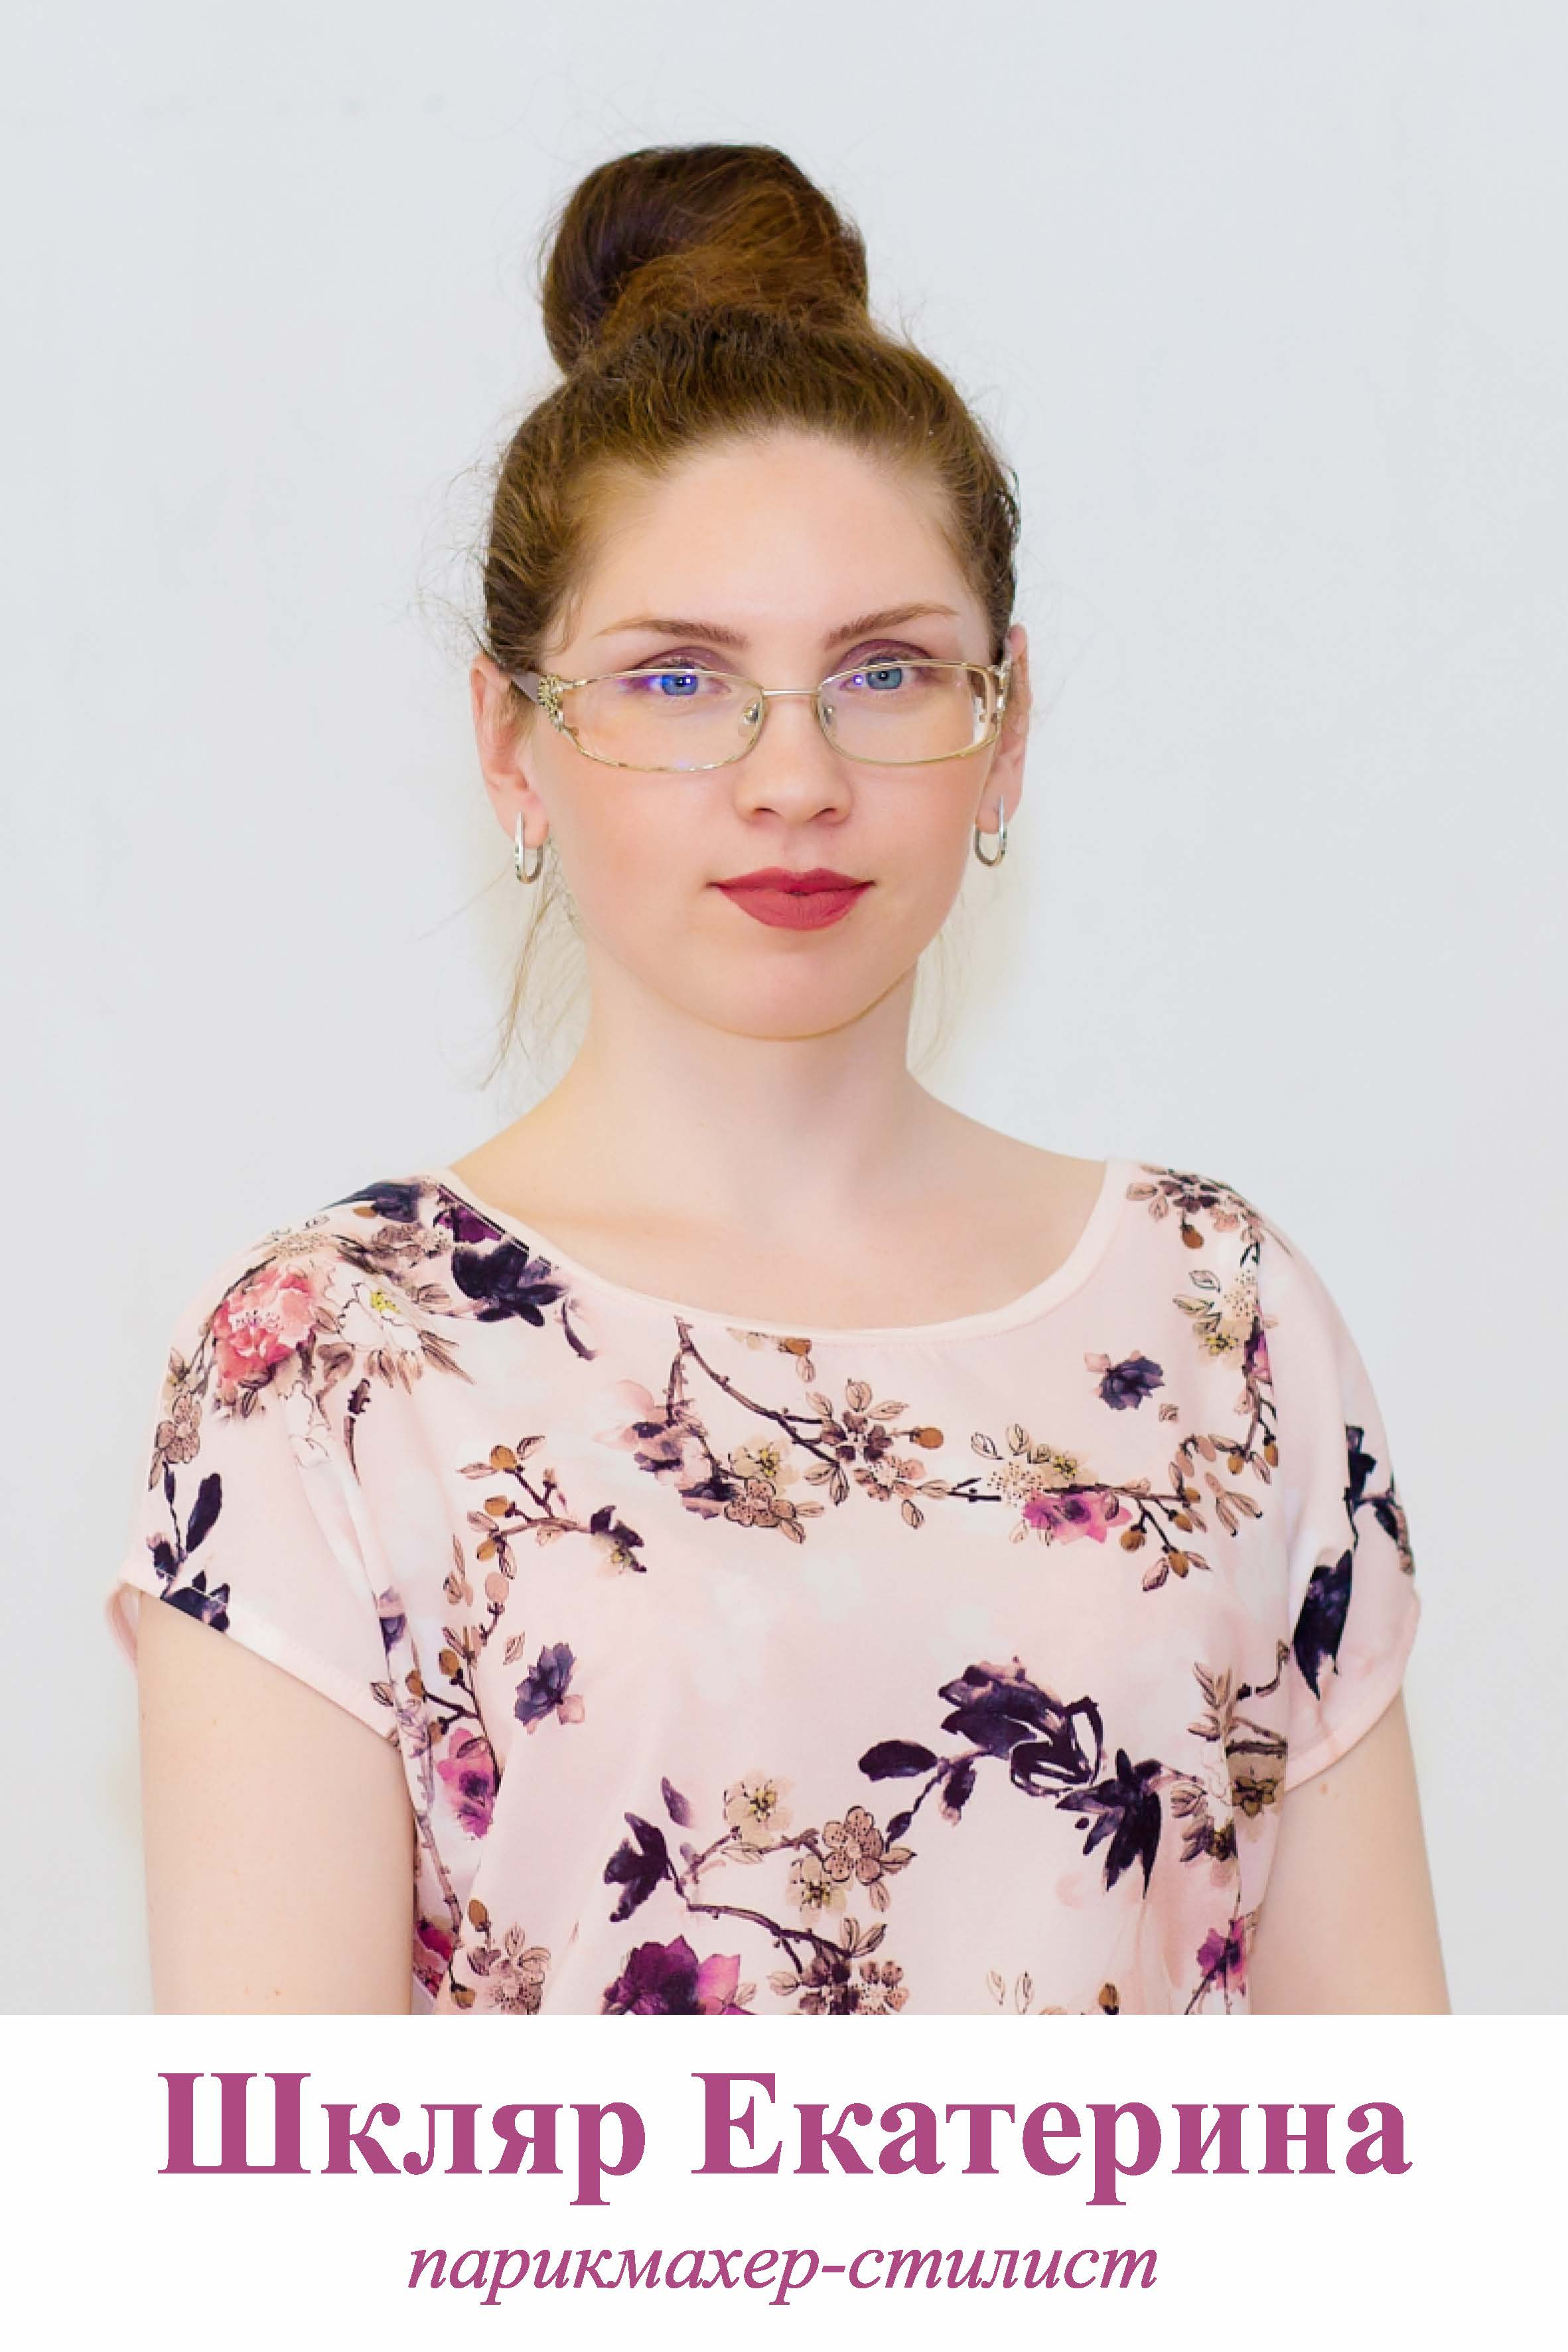 Екатерина Шкляр